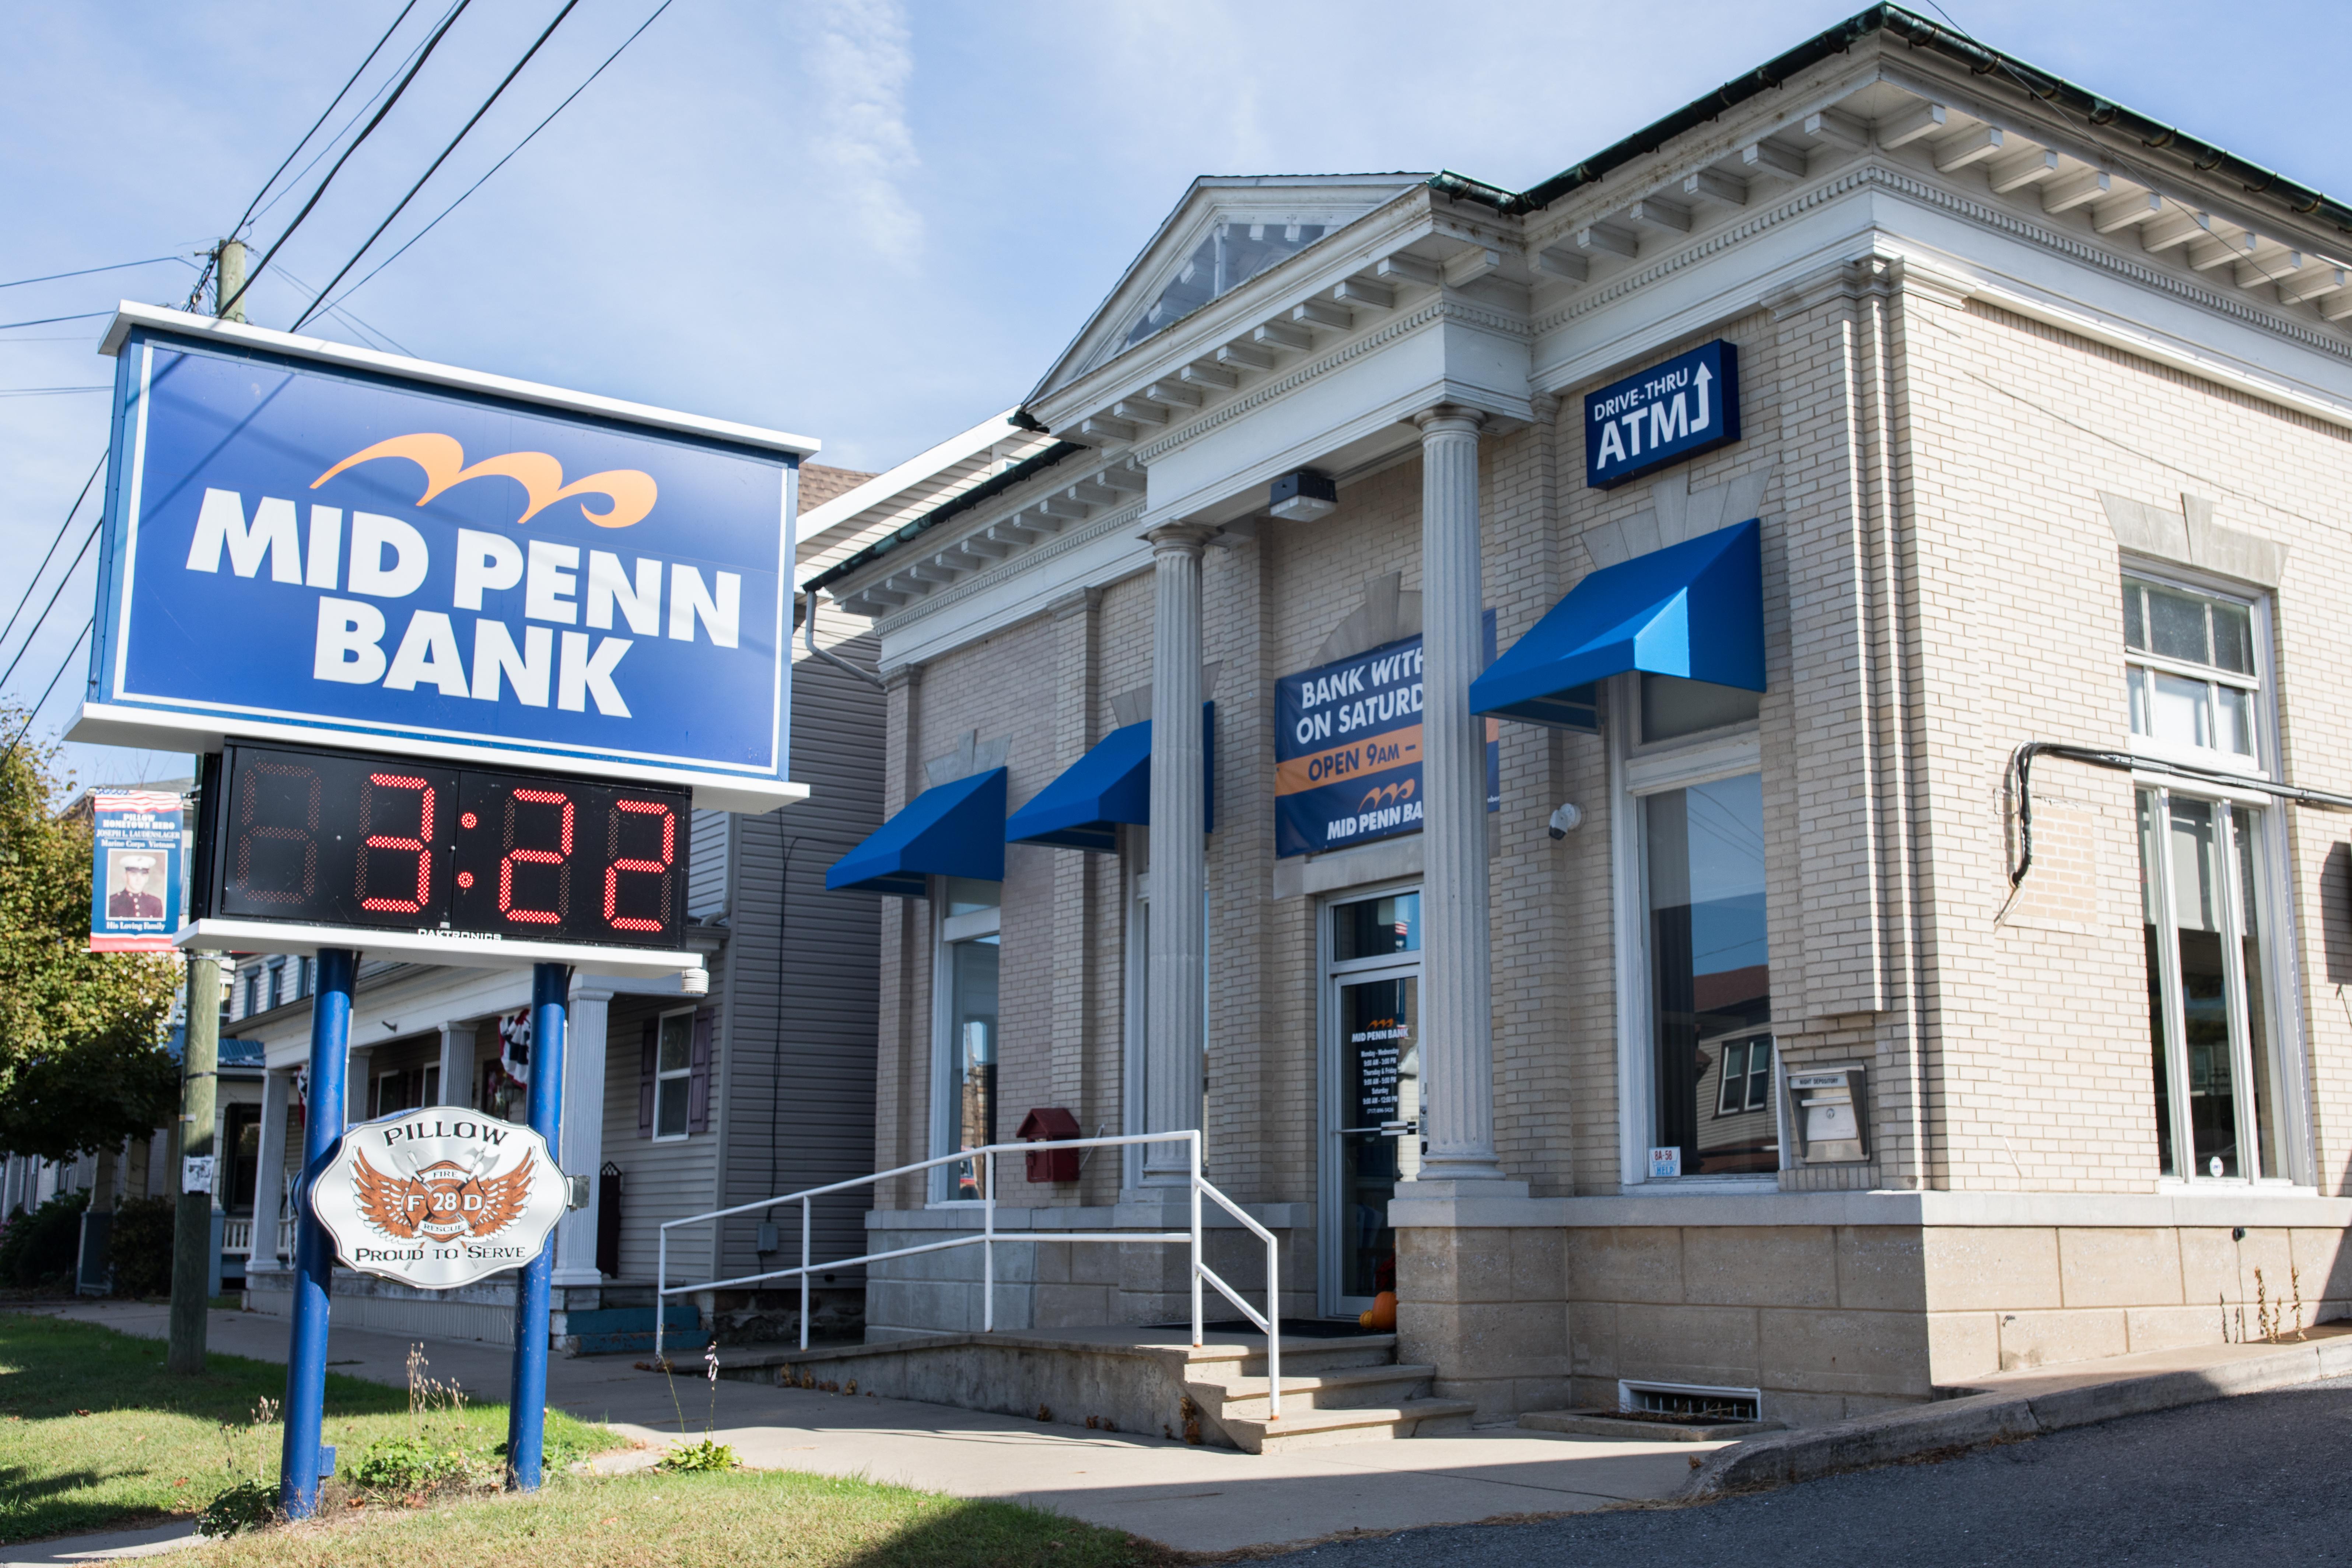 Successful rebranding of Mid Penn Bank by Egan Sign